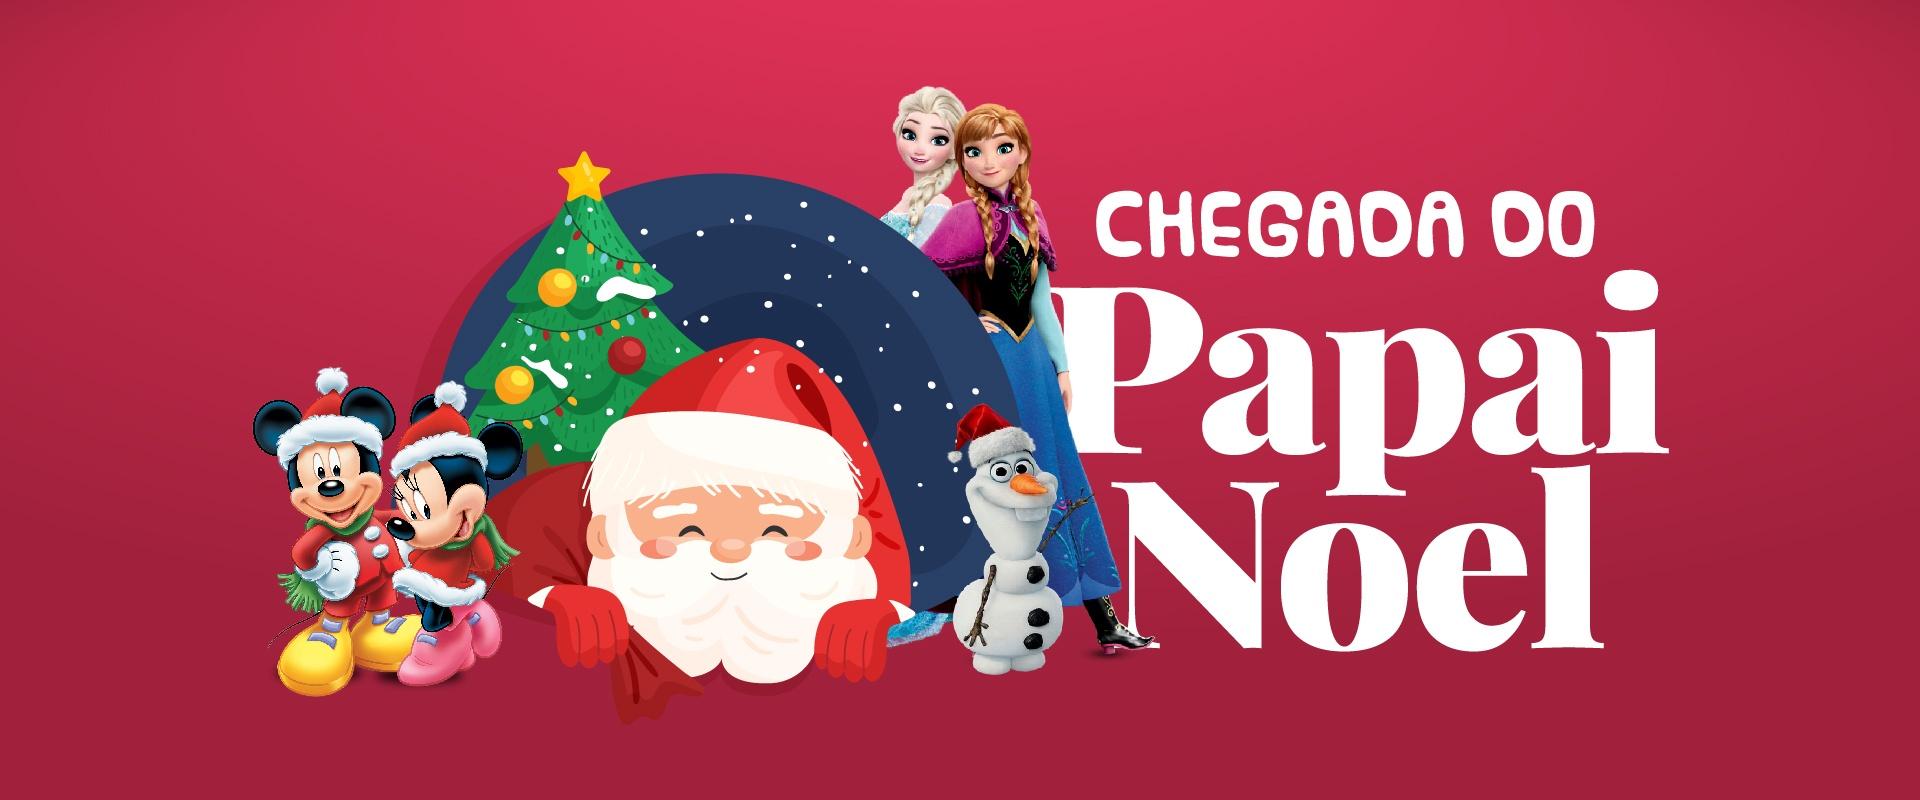 site_papai noel_Site_banner